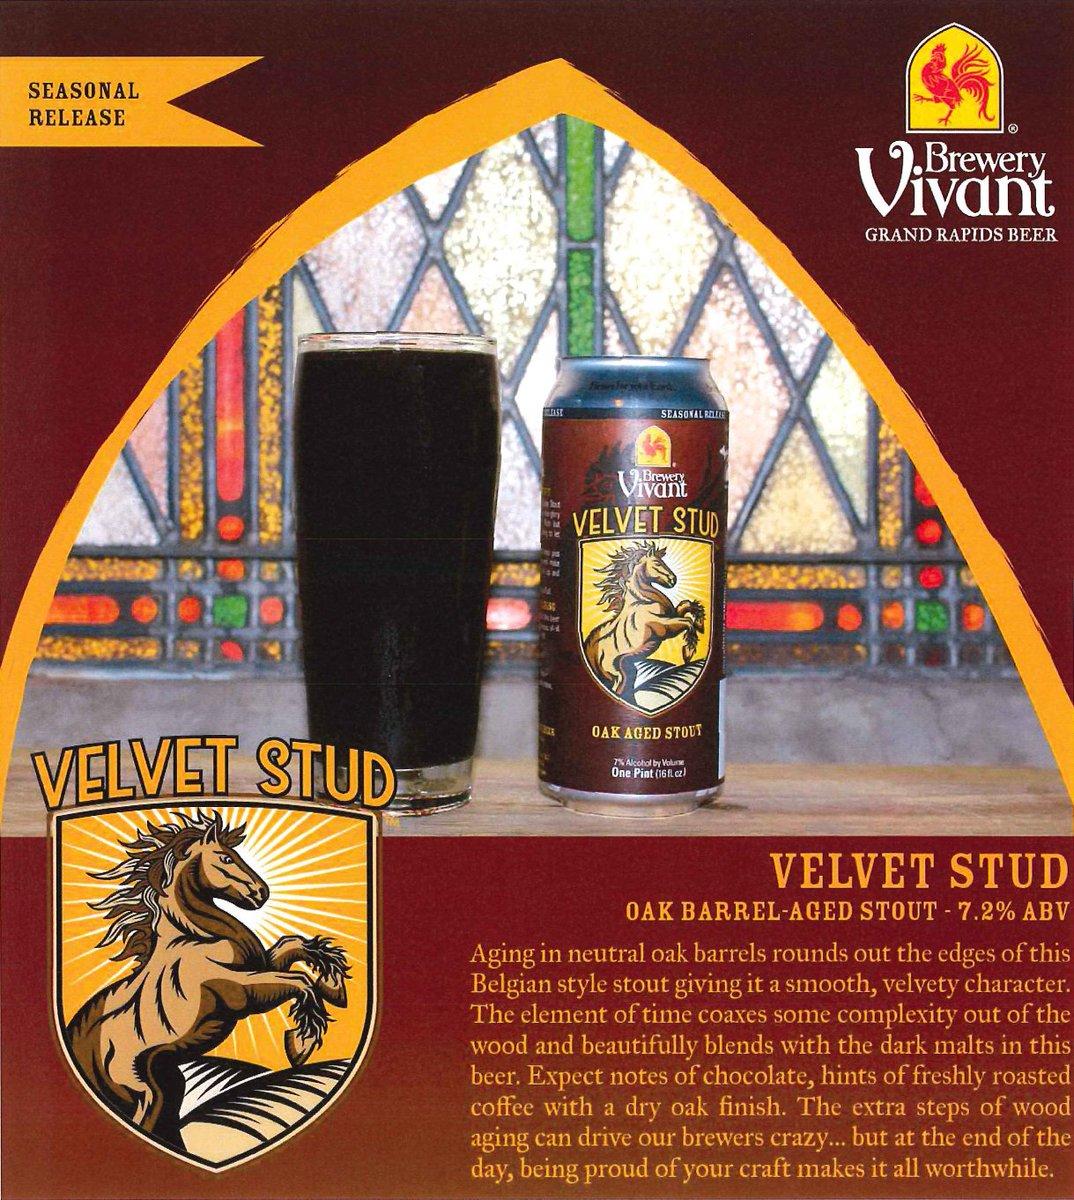 Interior Design Jobs Sacramento Aaen Engineering Kalamazoo Studs New Michigan Beers Available Now Breweryvivant Velvet Stud Newhollandbrew Baltic